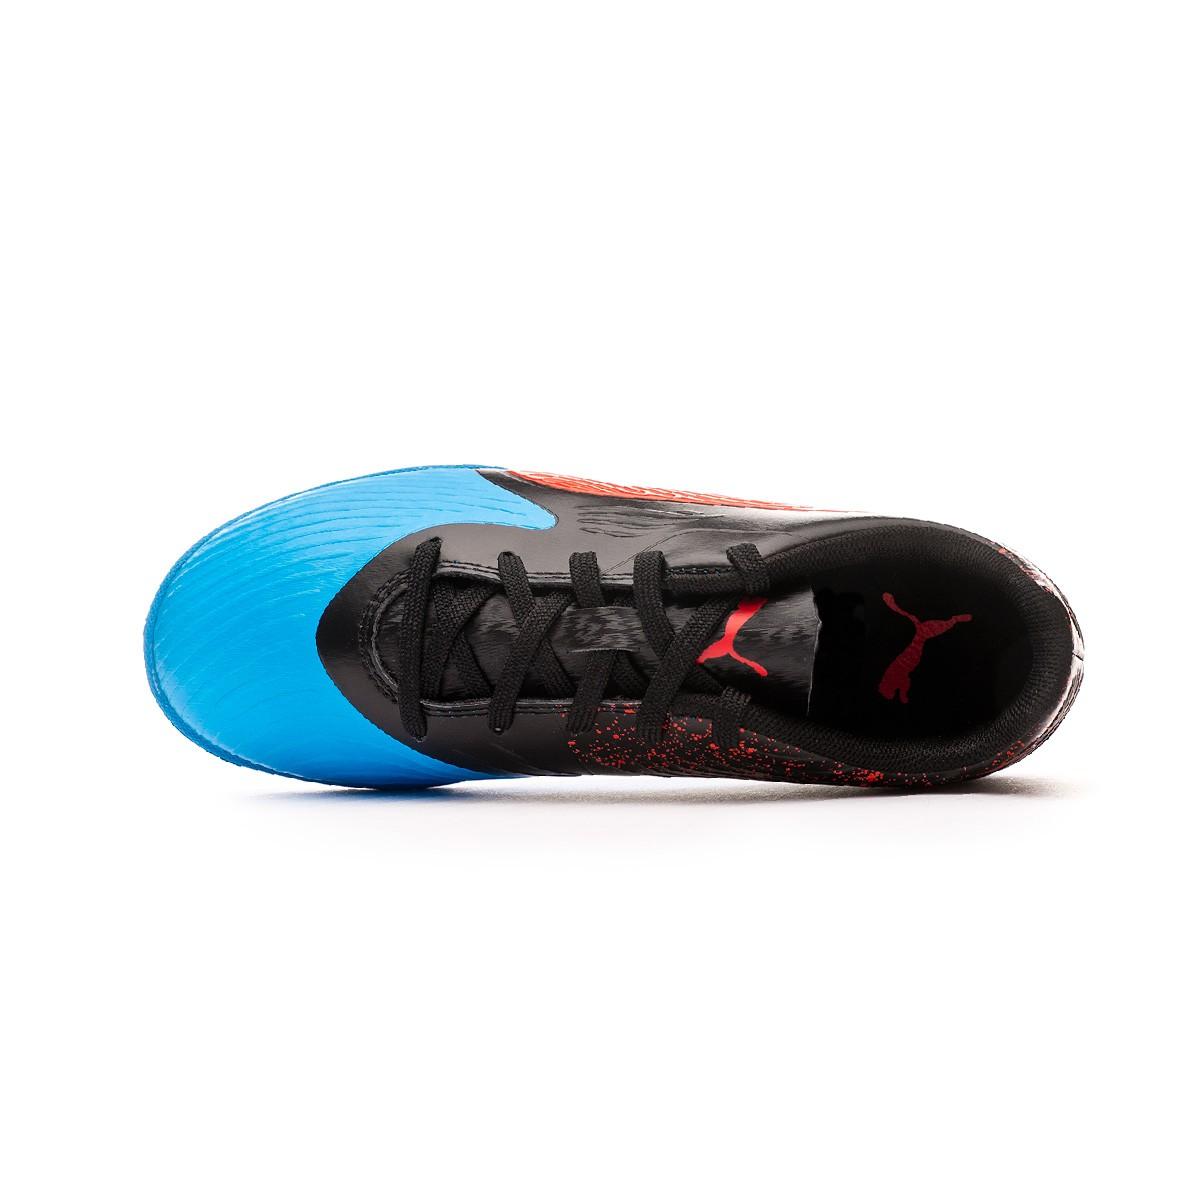 a28505f18f3fa Tenis Puma One 19.4 IT Niño Bleu azur-Red blast-Black - Tienda de fútbol  Fútbol Emotion